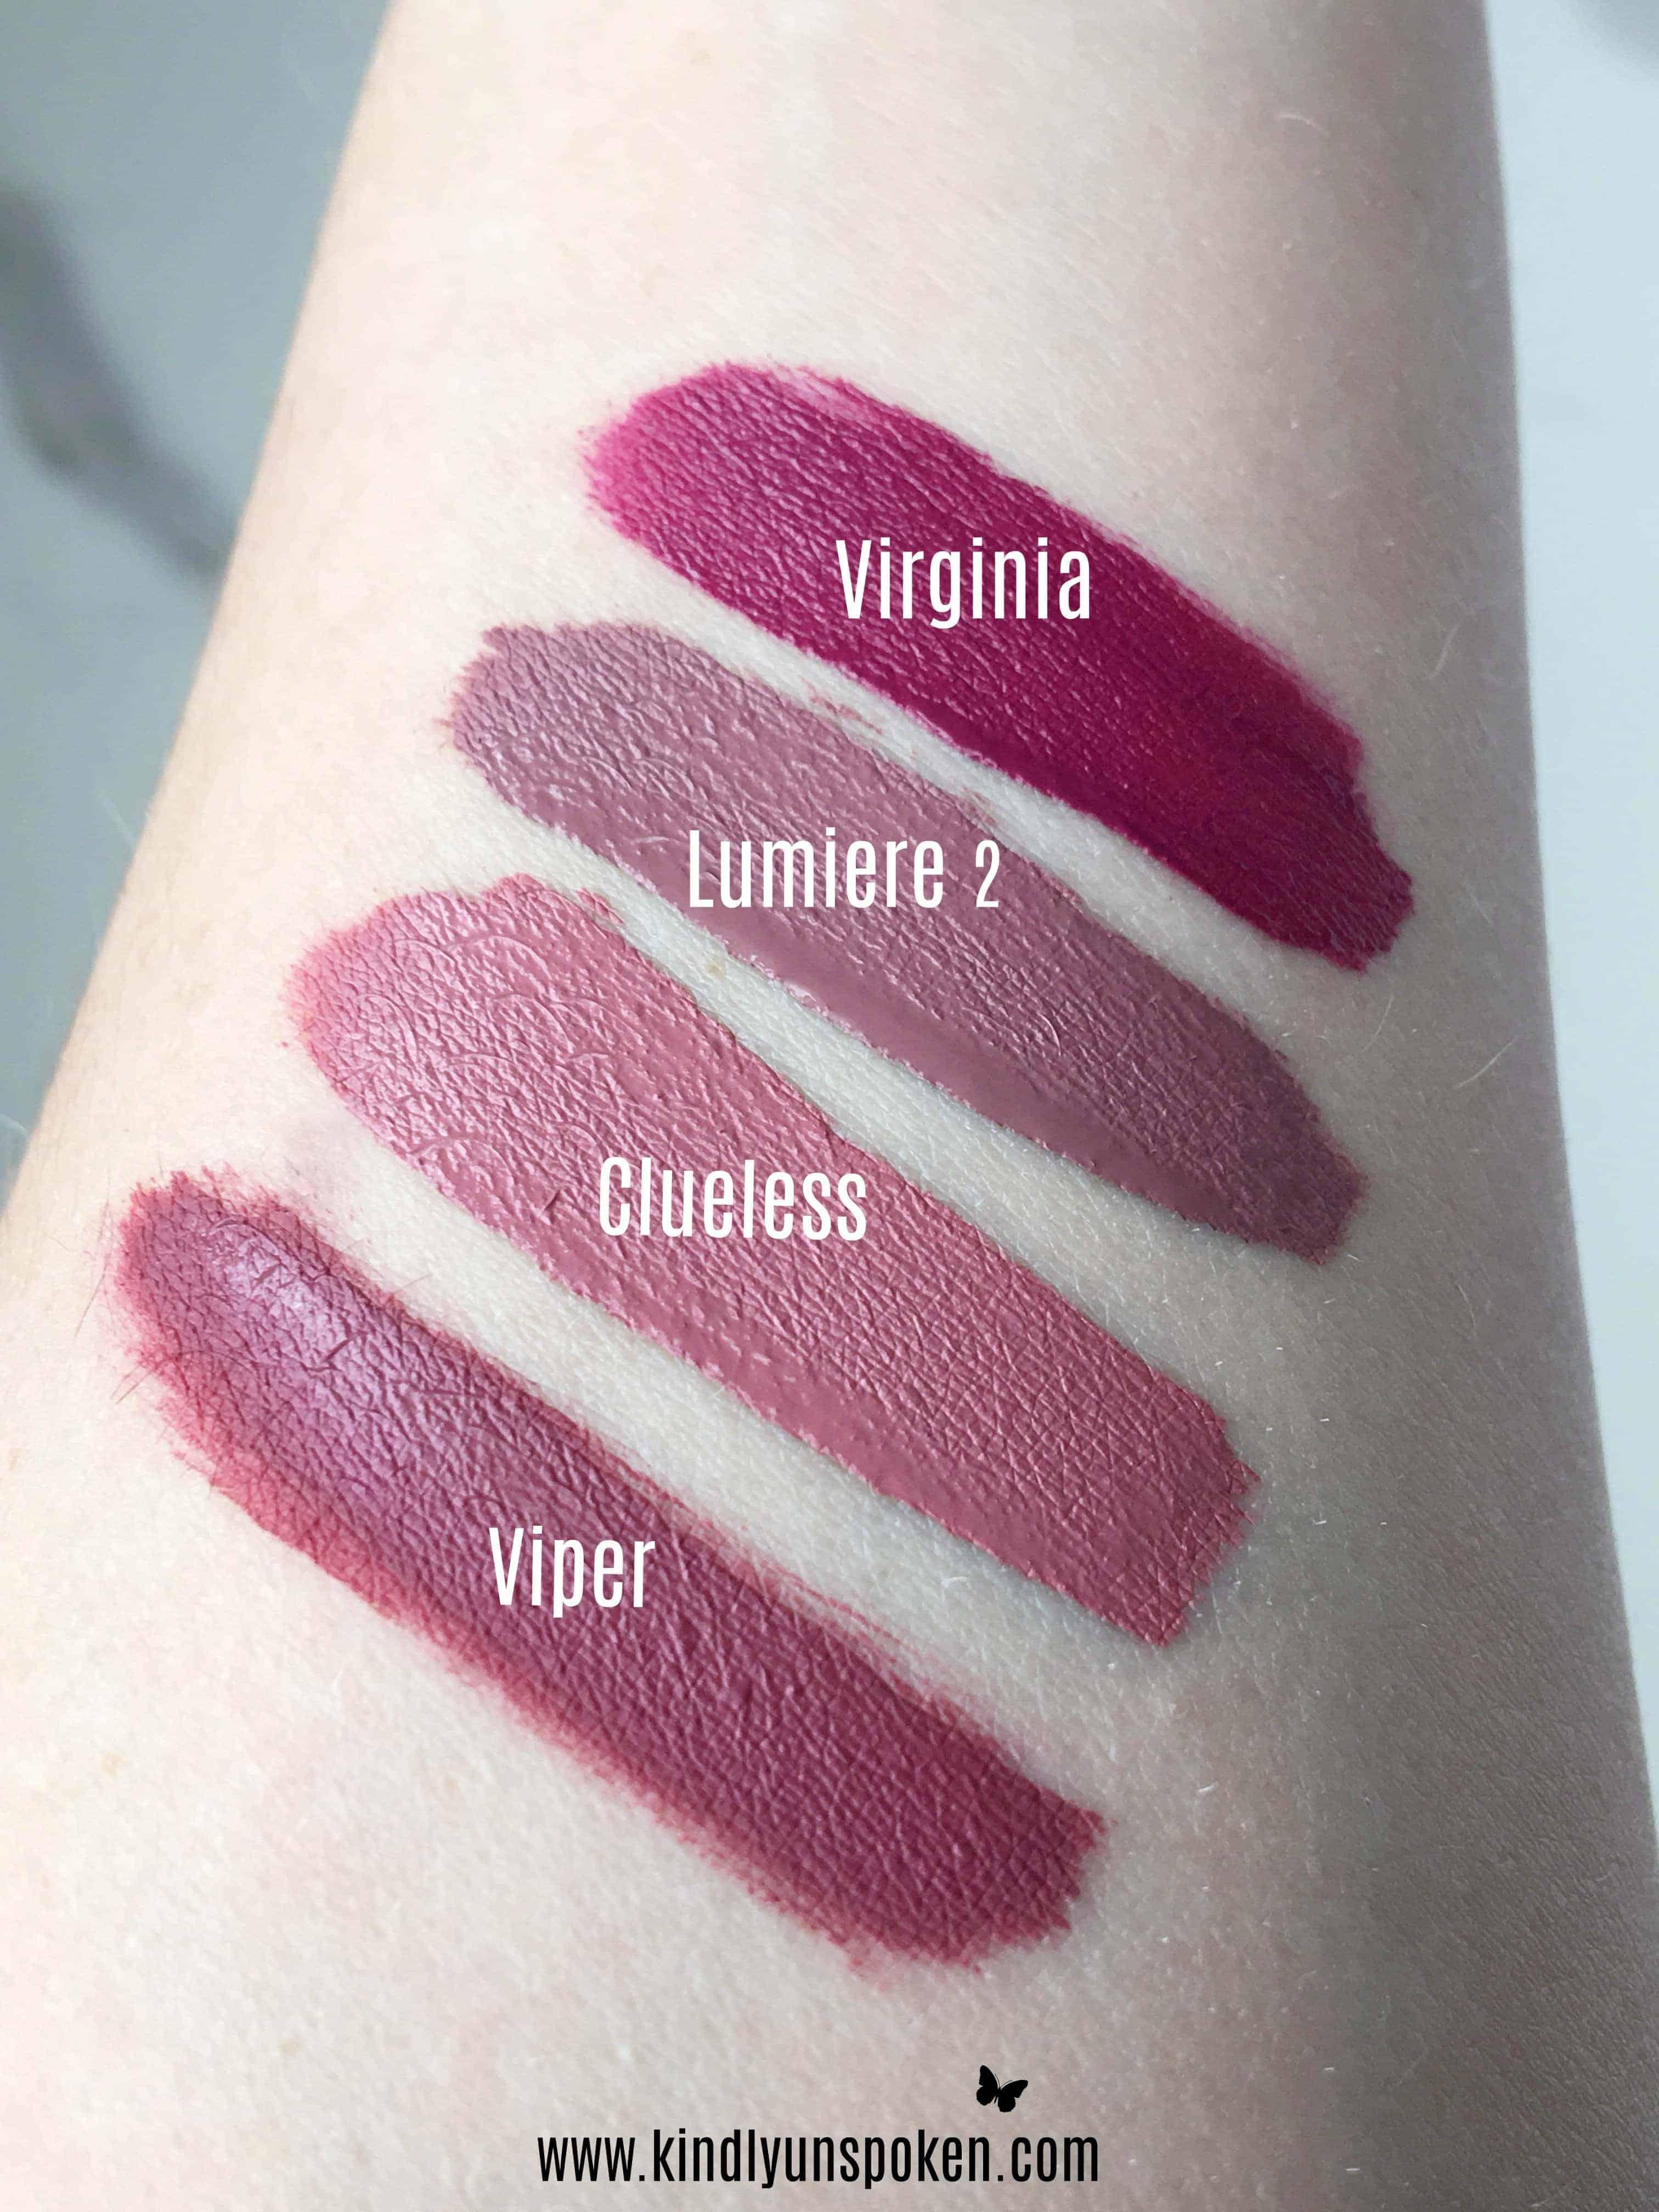 Best ColourPop Lipsticks- Review + Swatches